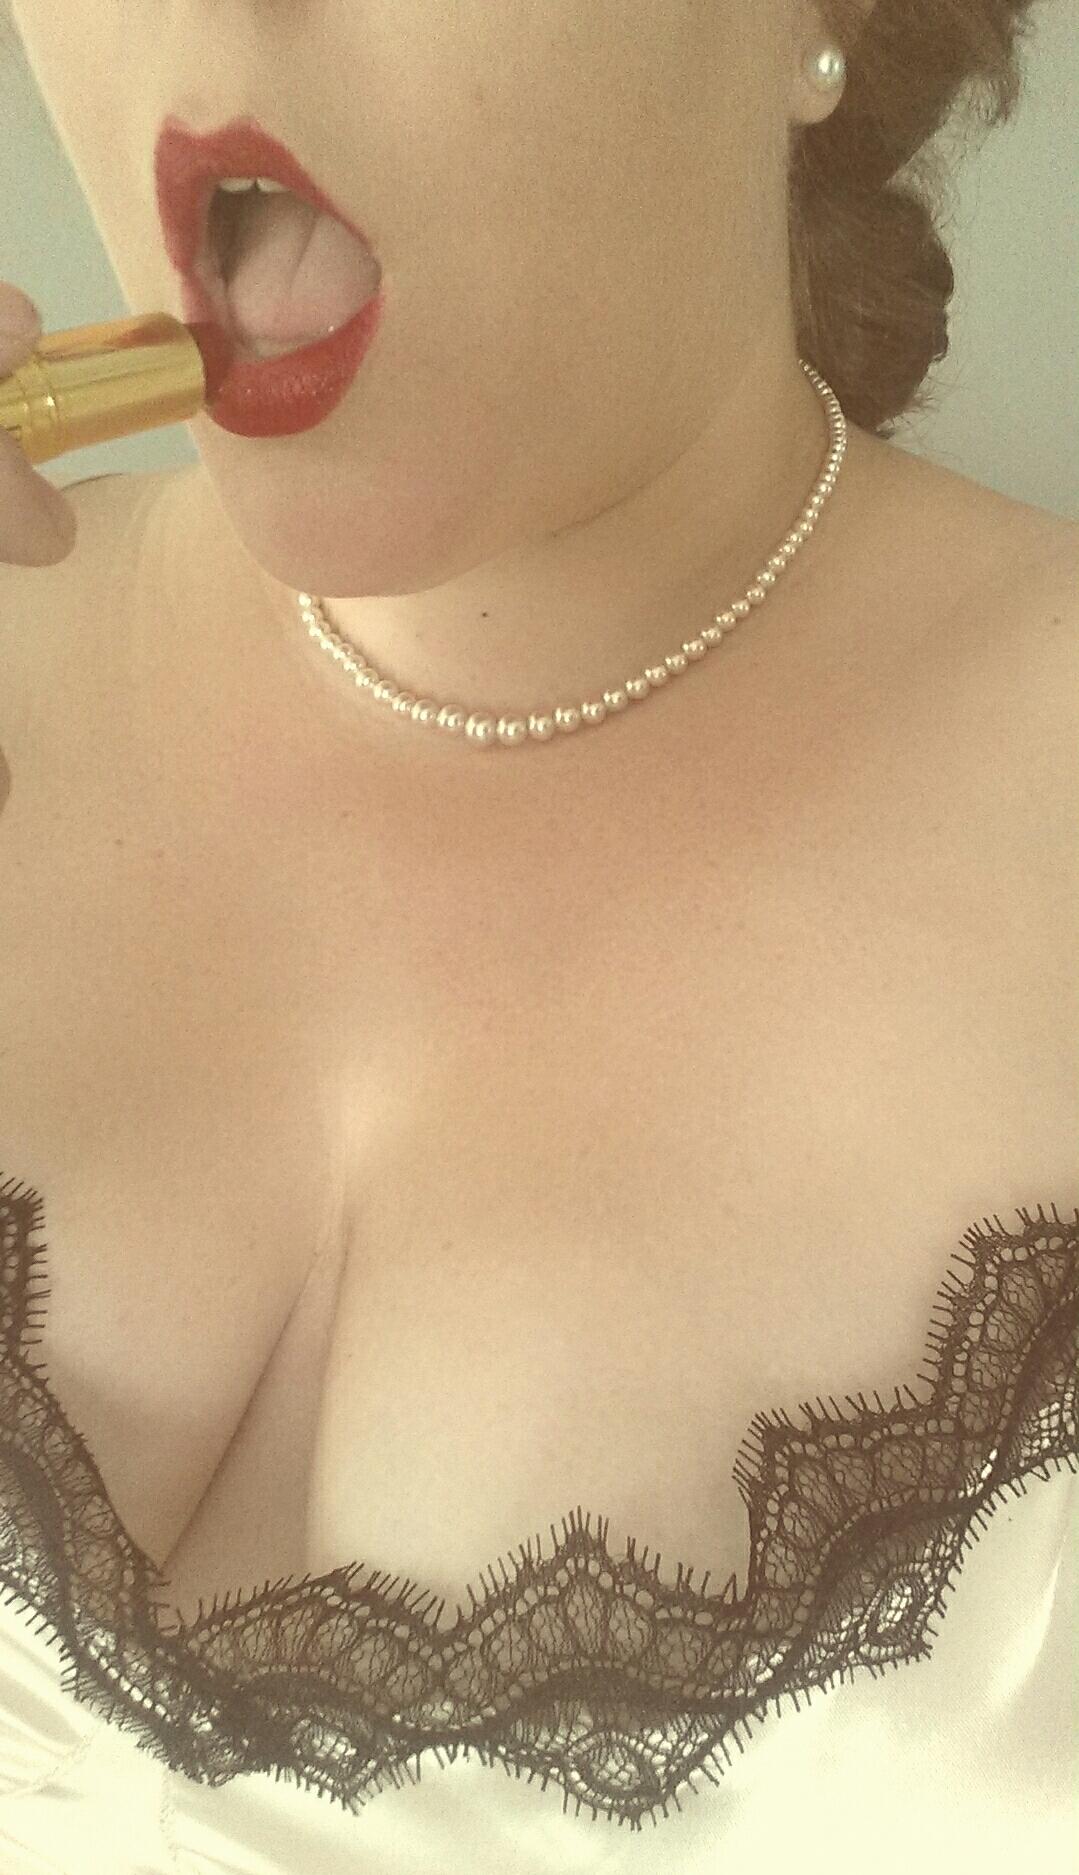 Pearls, Mirror, Lipstick